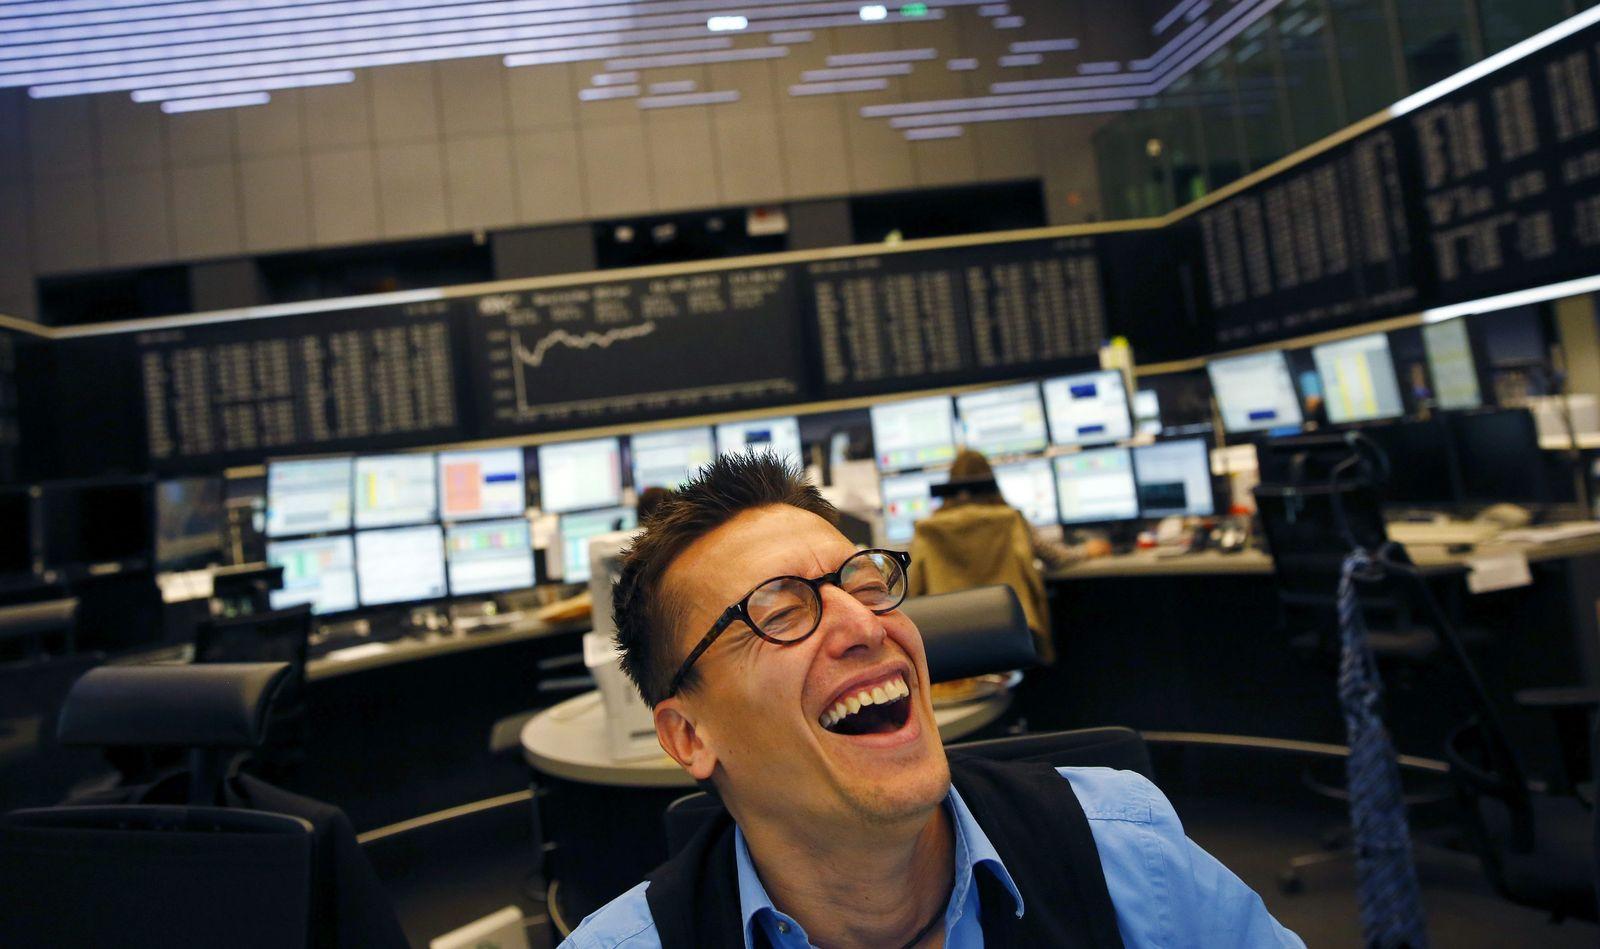 DAX / Börse Frankfurt / Positiv / steigt